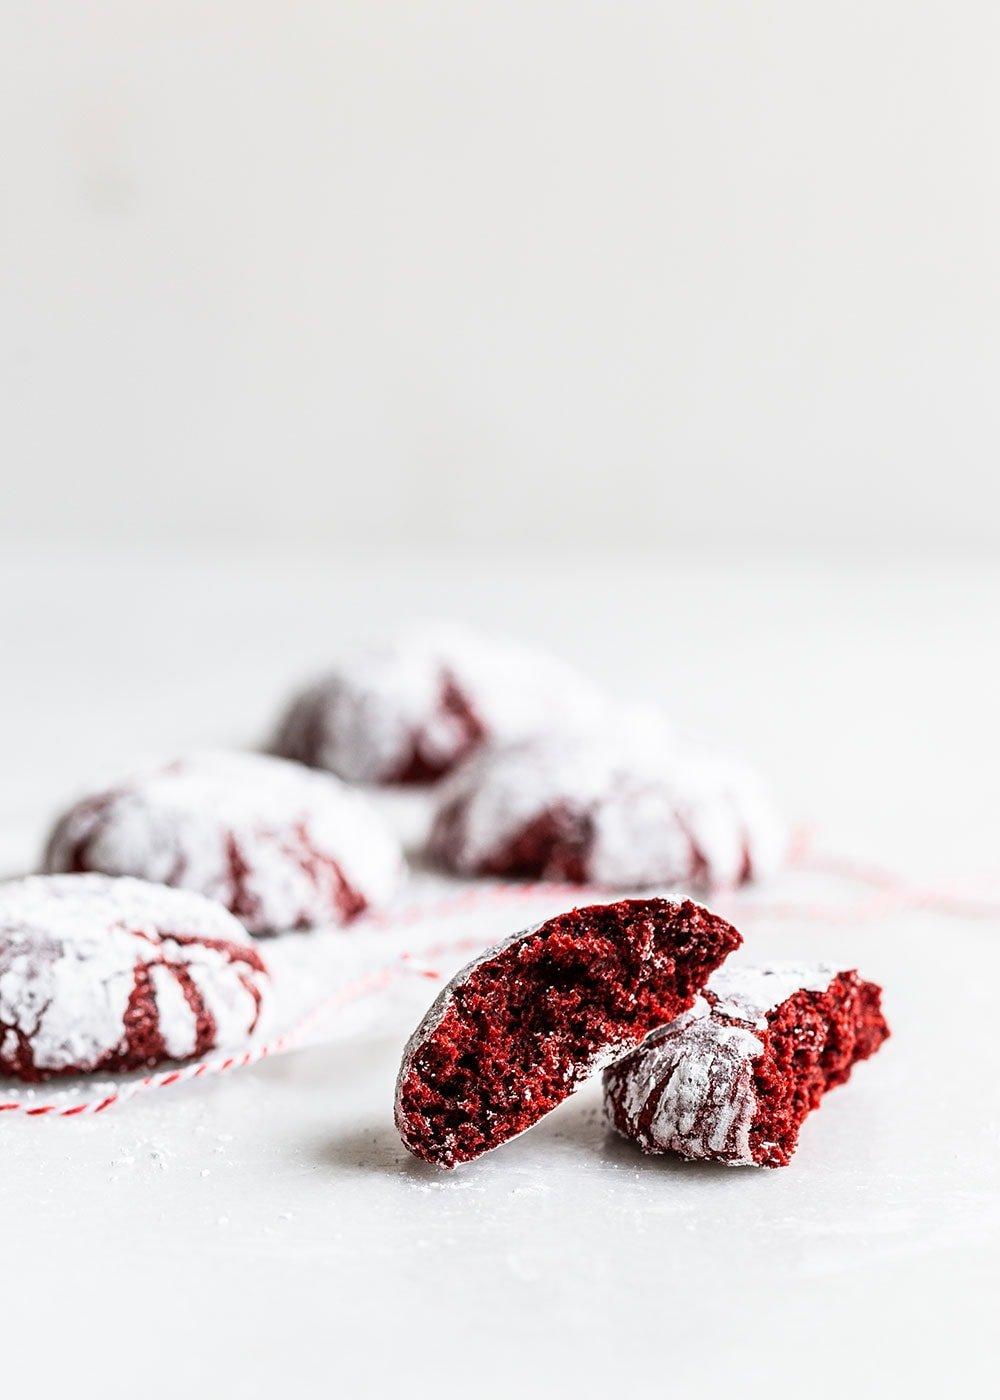 Red Velvet Crinkle cookie broken up to reveal soft interior